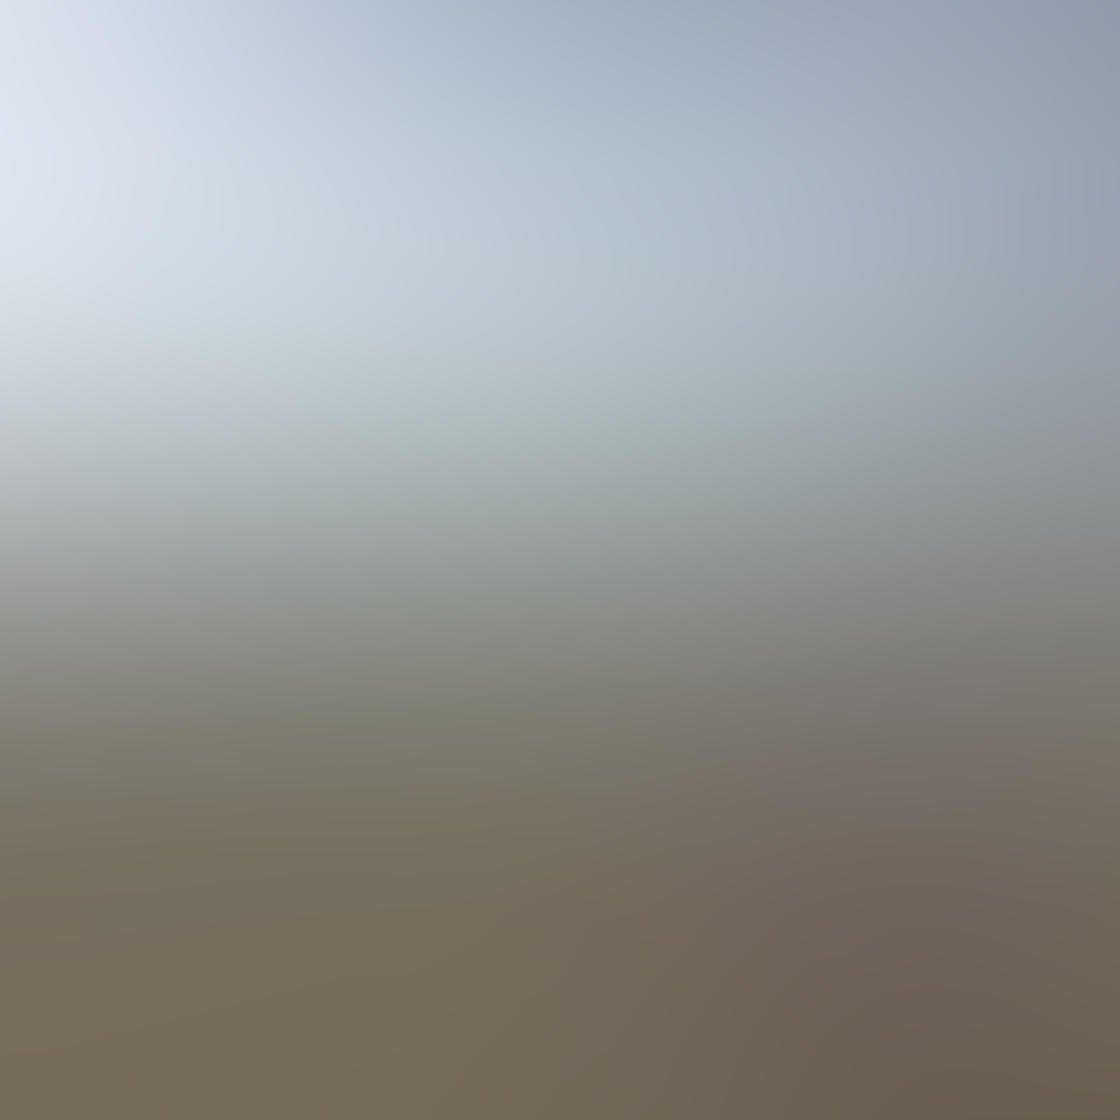 Vsco filters 28